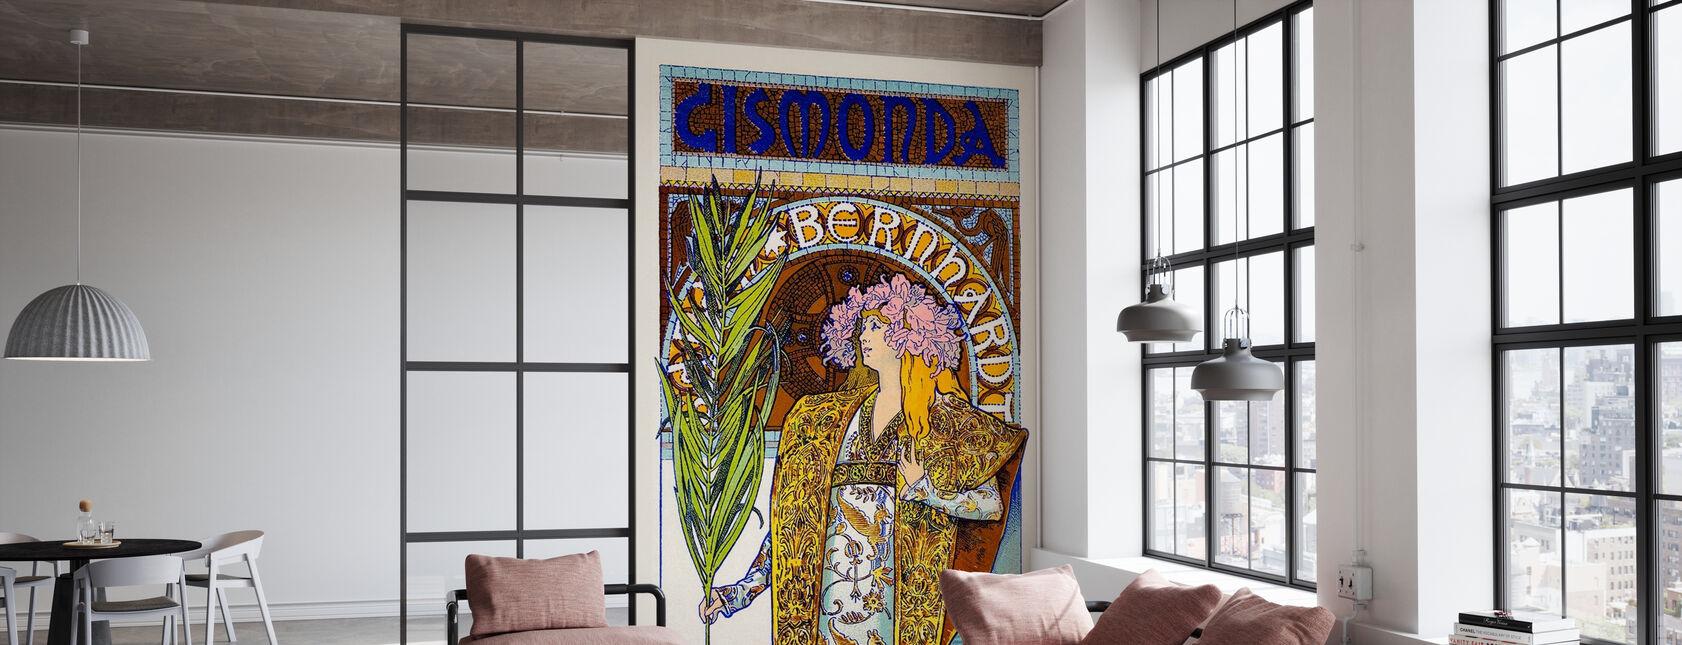 Alphonse Mucha - Theatre Renaissance - Wallpaper - Office